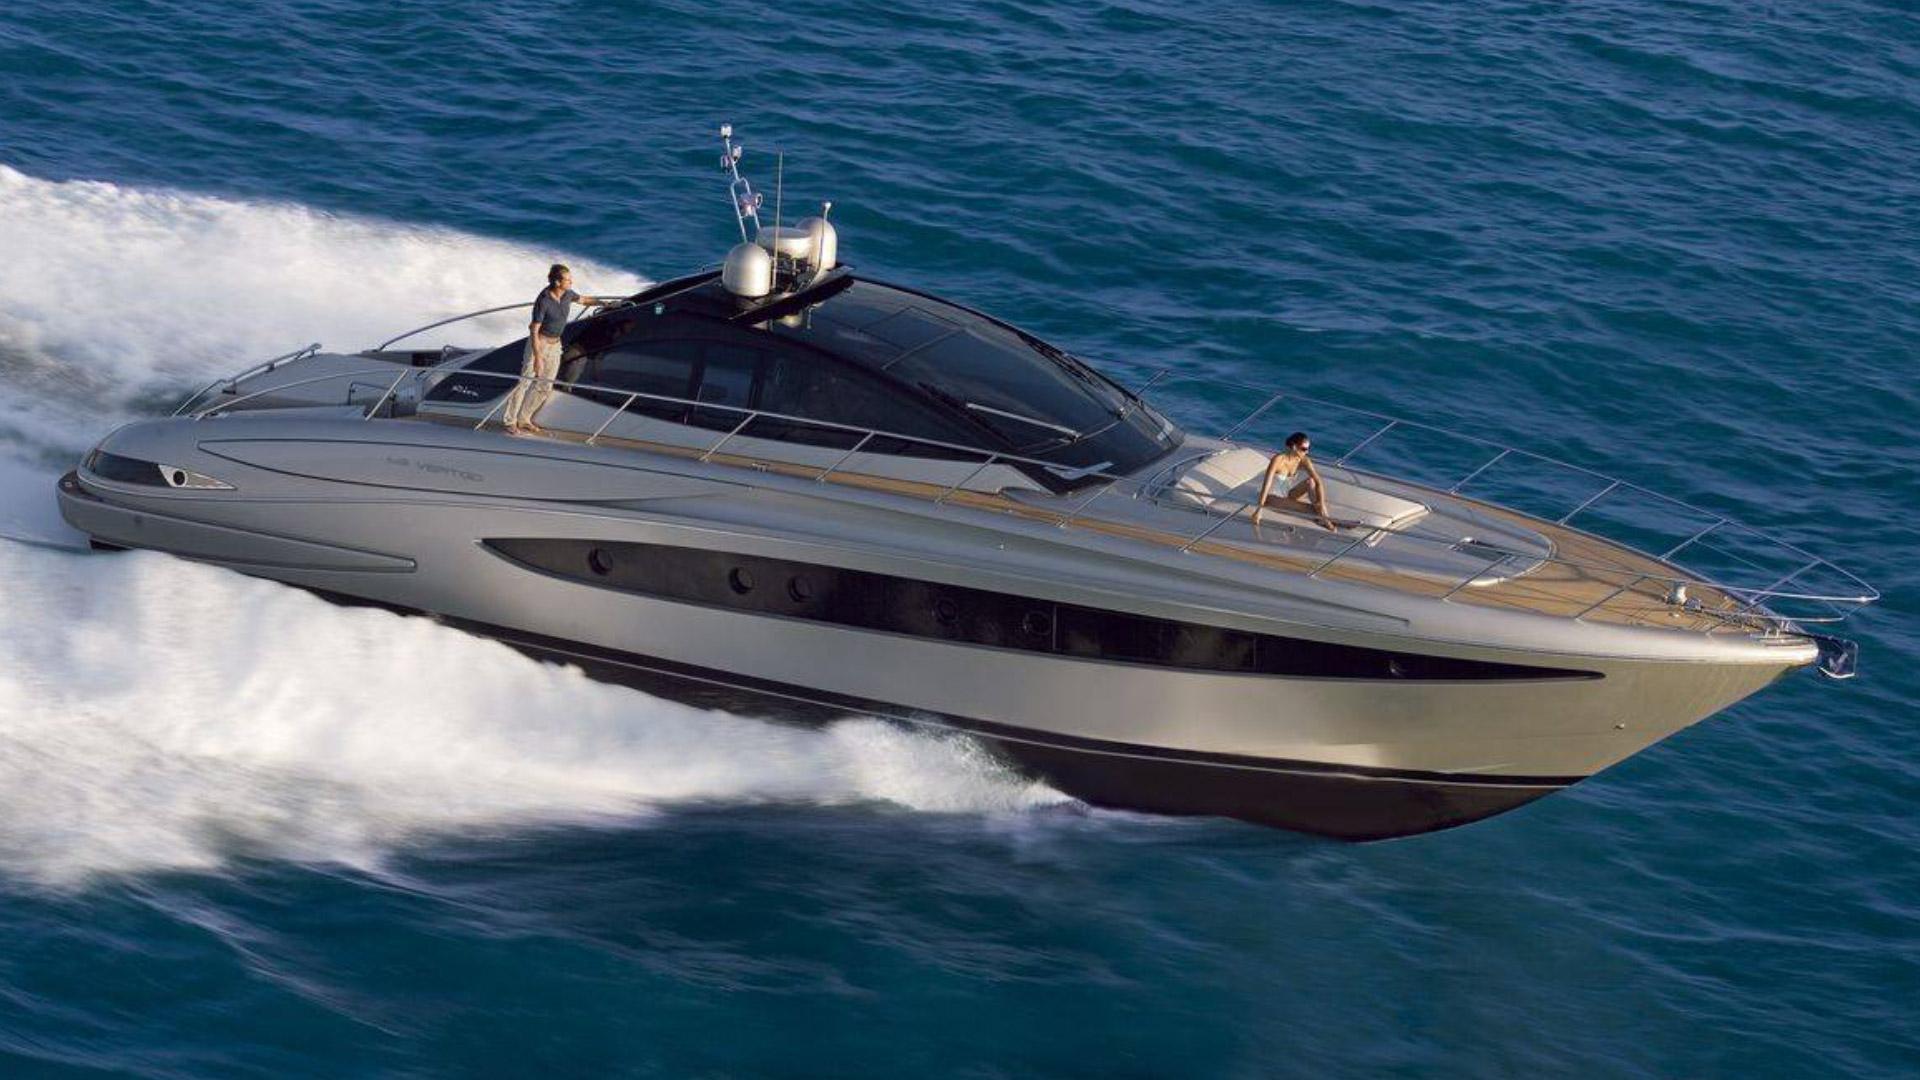 diabolik yacht charter details riva charterworld luxury. Black Bedroom Furniture Sets. Home Design Ideas